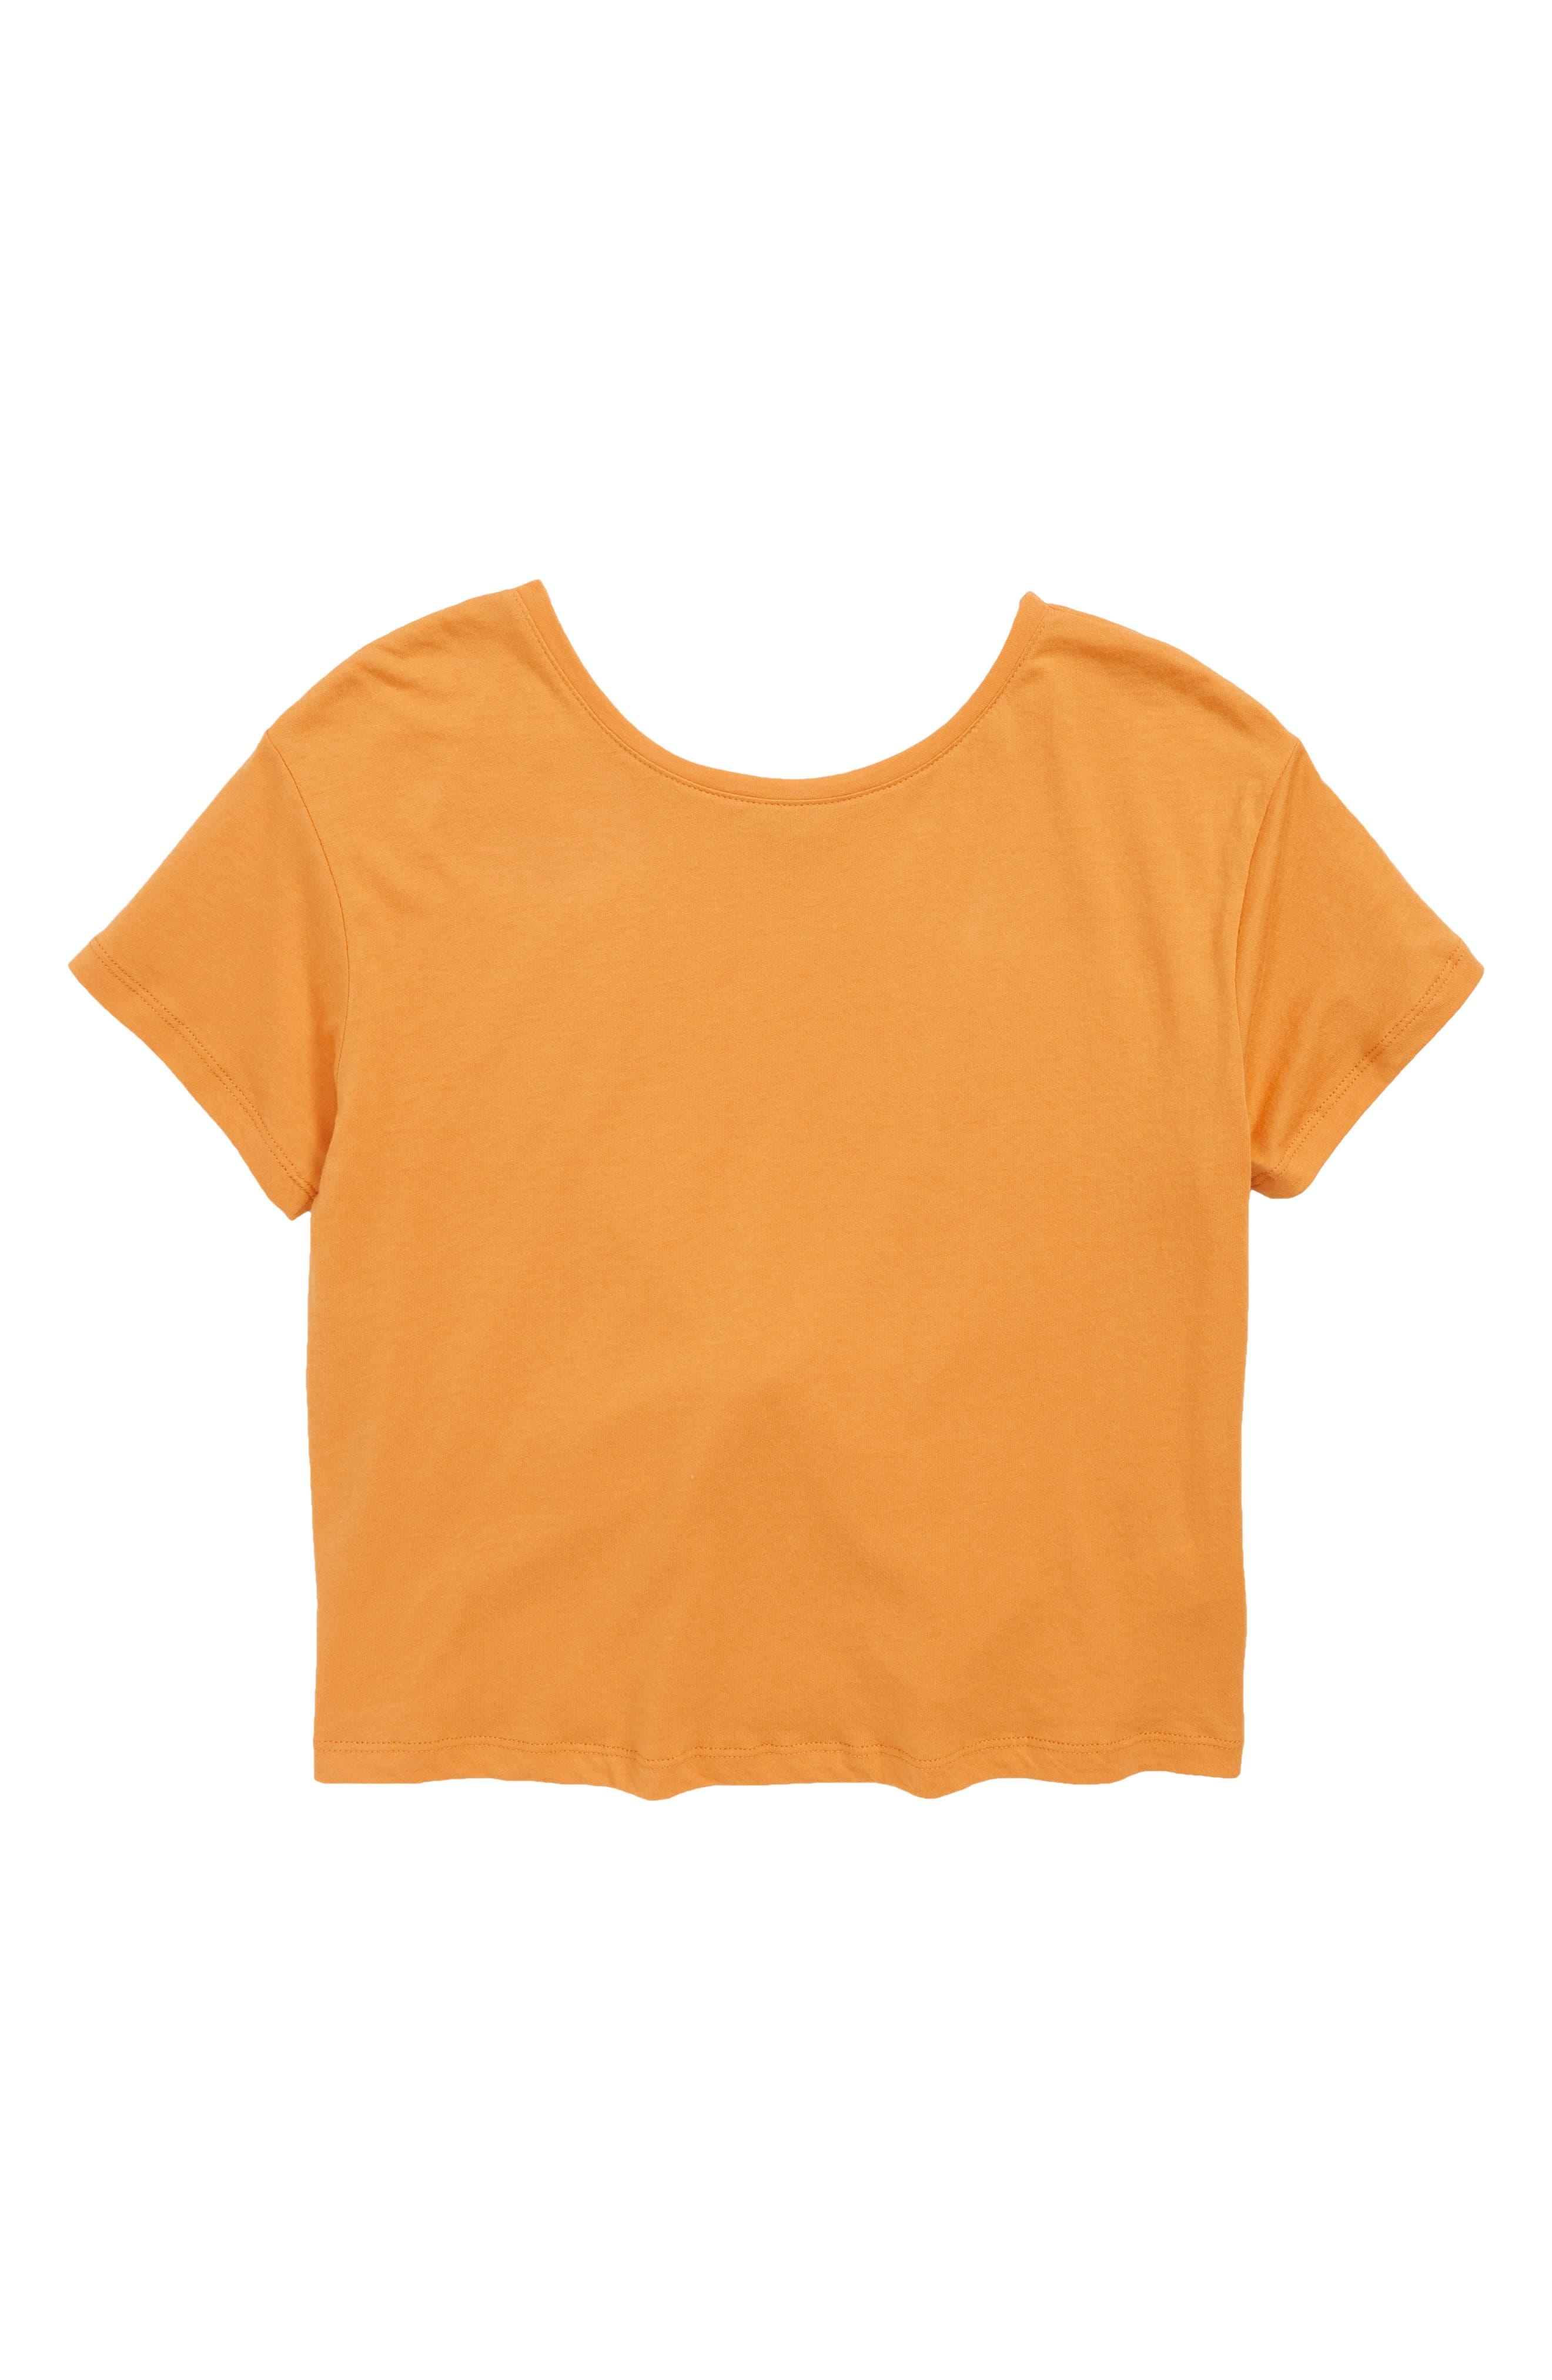 Jerrica Twist Back Top,                         Main,                         color, ORANGE